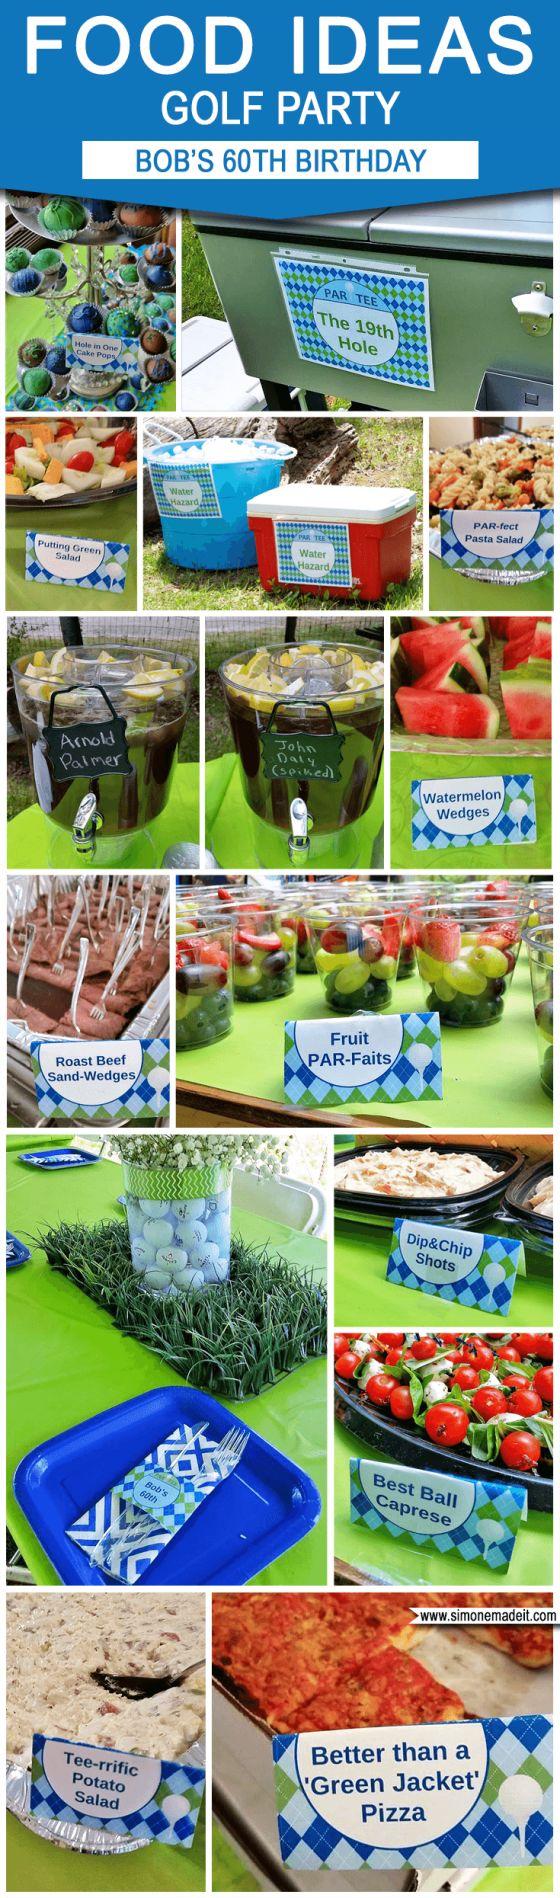 Golf Party Food Ideas | Golf Party Drinks Ideas | Golf Birthday Party Theme